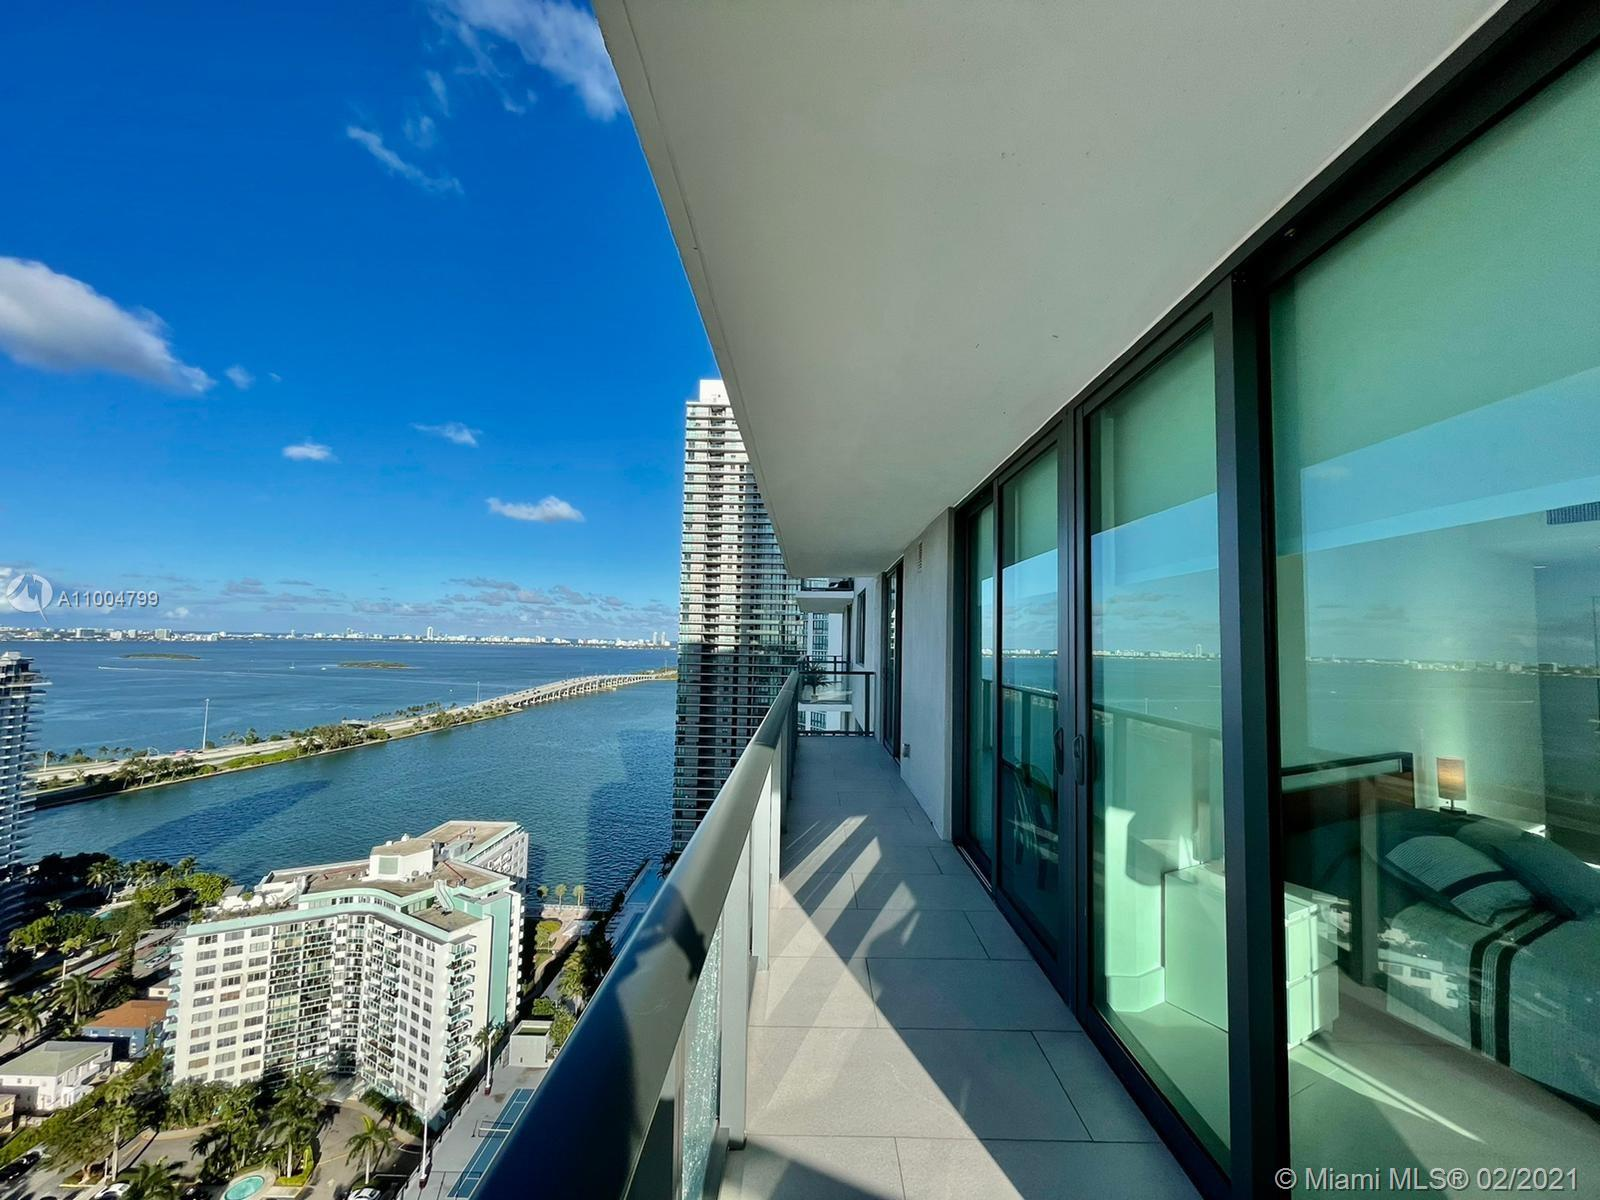 Paraiso Bayviews #2910 - 501 NE 31st St #2910, Miami, FL 33137